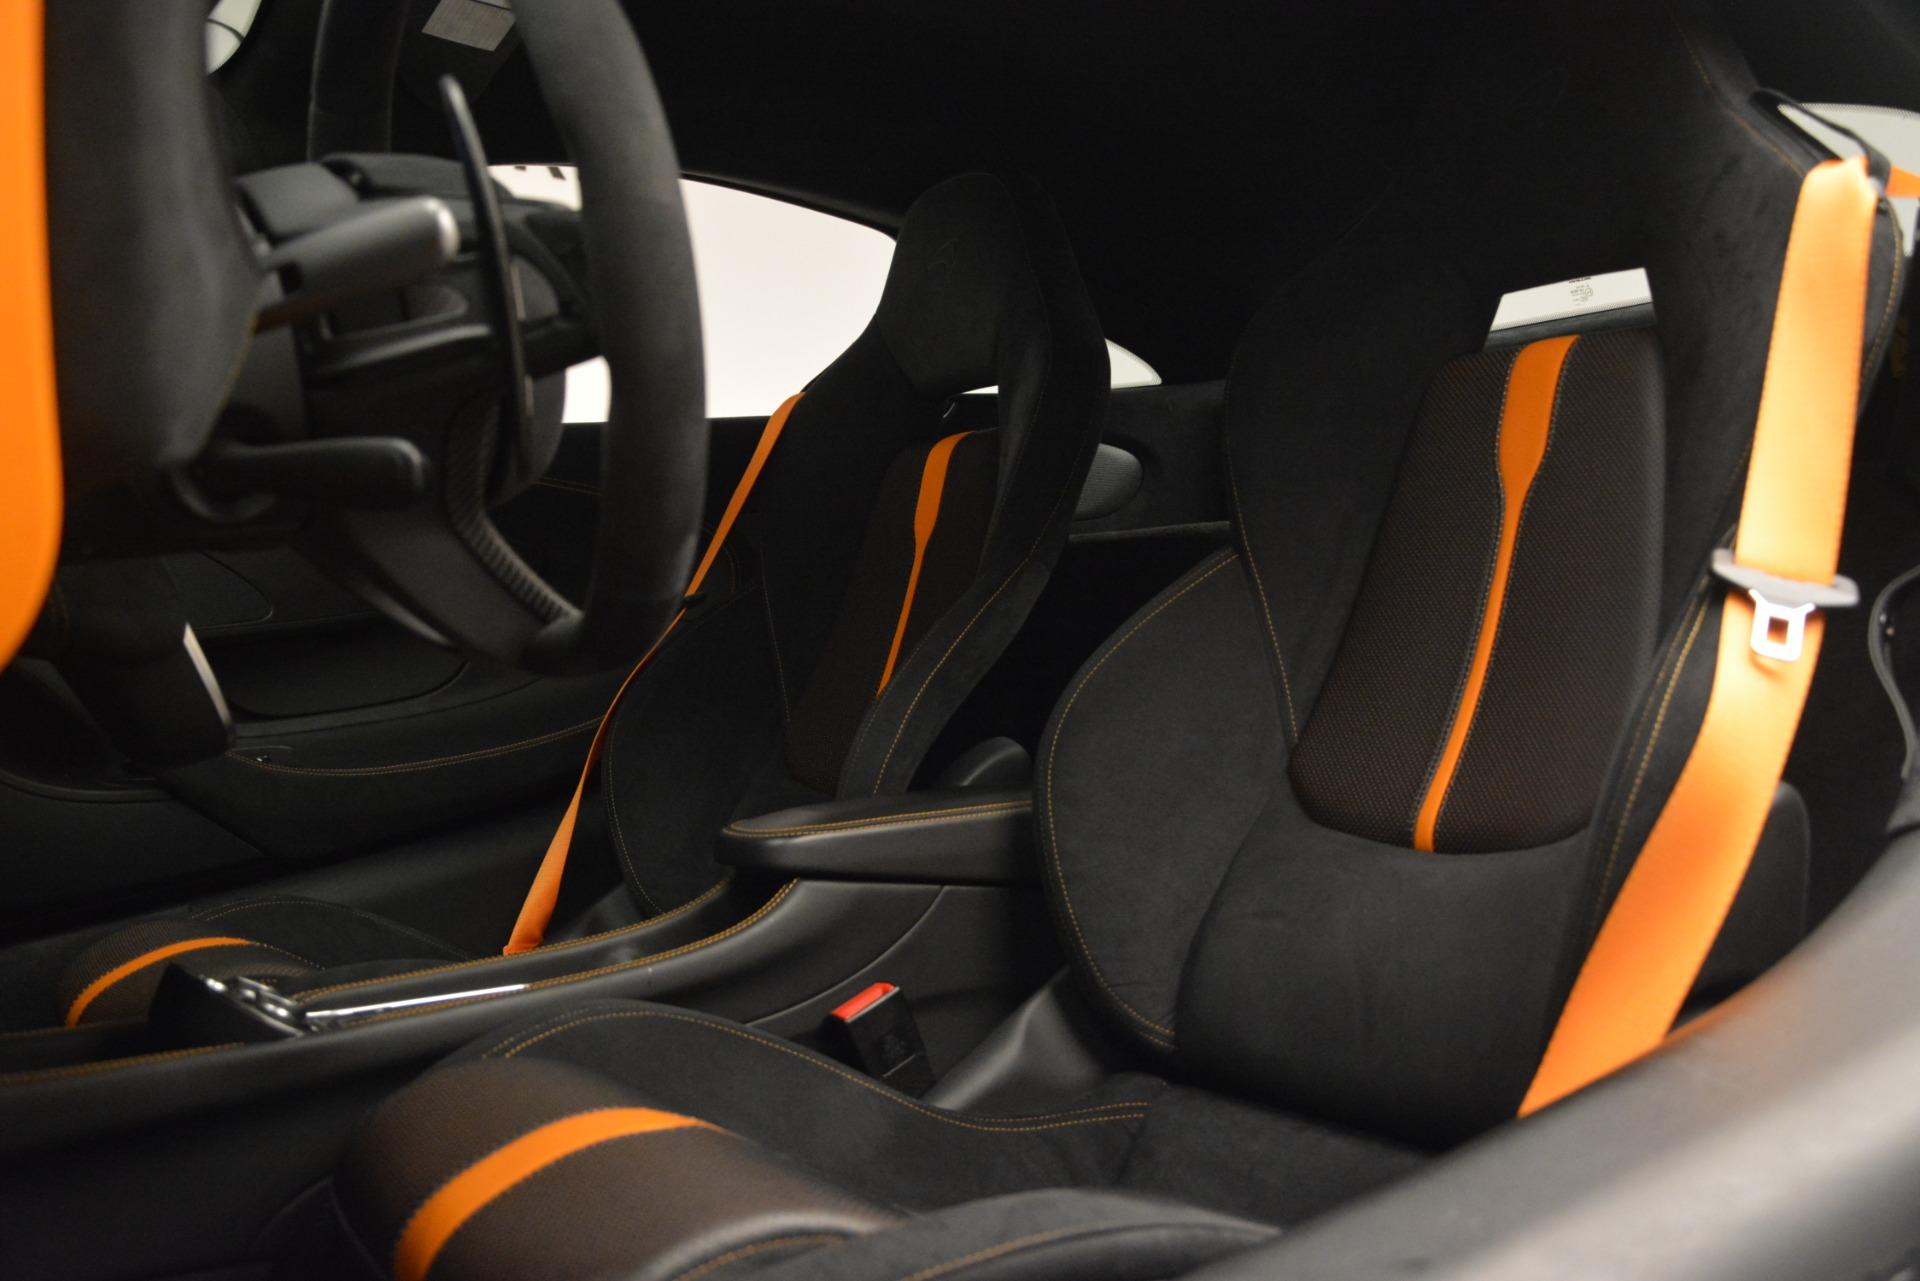 Used 2017 McLaren 570S Coupe For Sale In Westport, CT 2842_p17